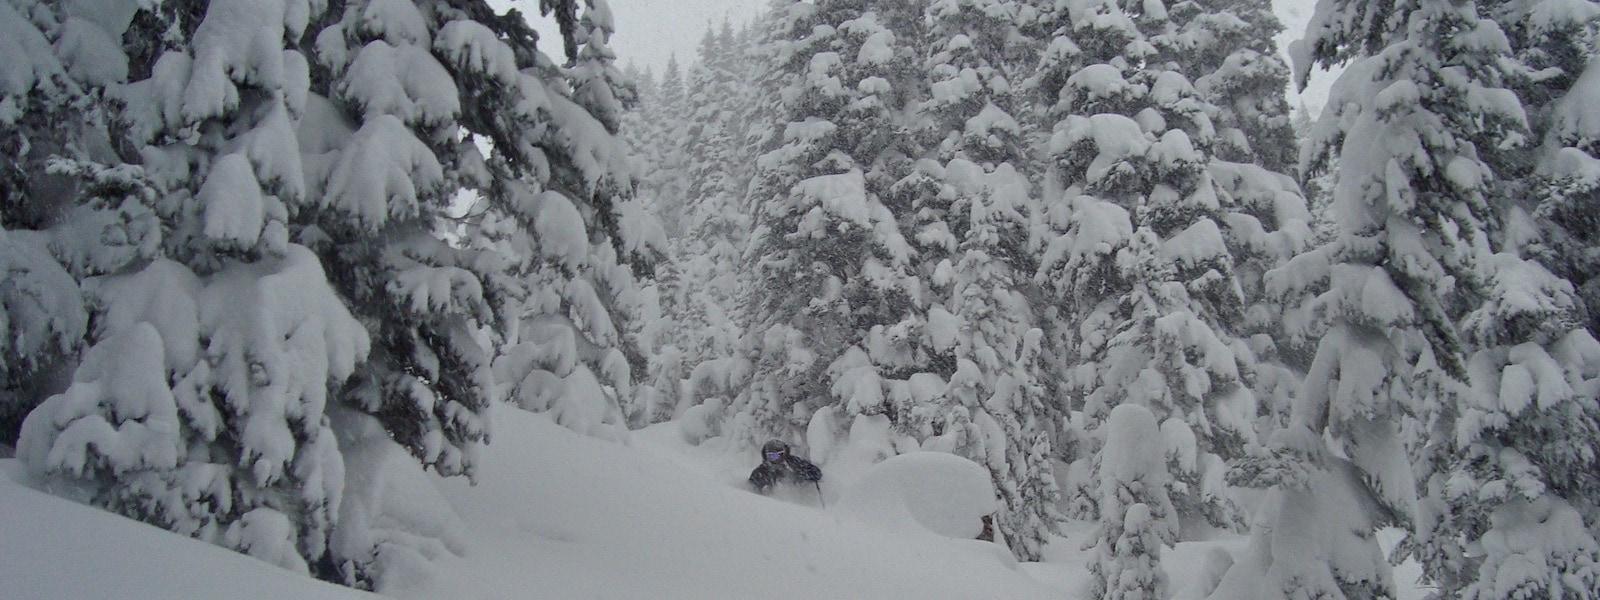 whistler backcountry skiing